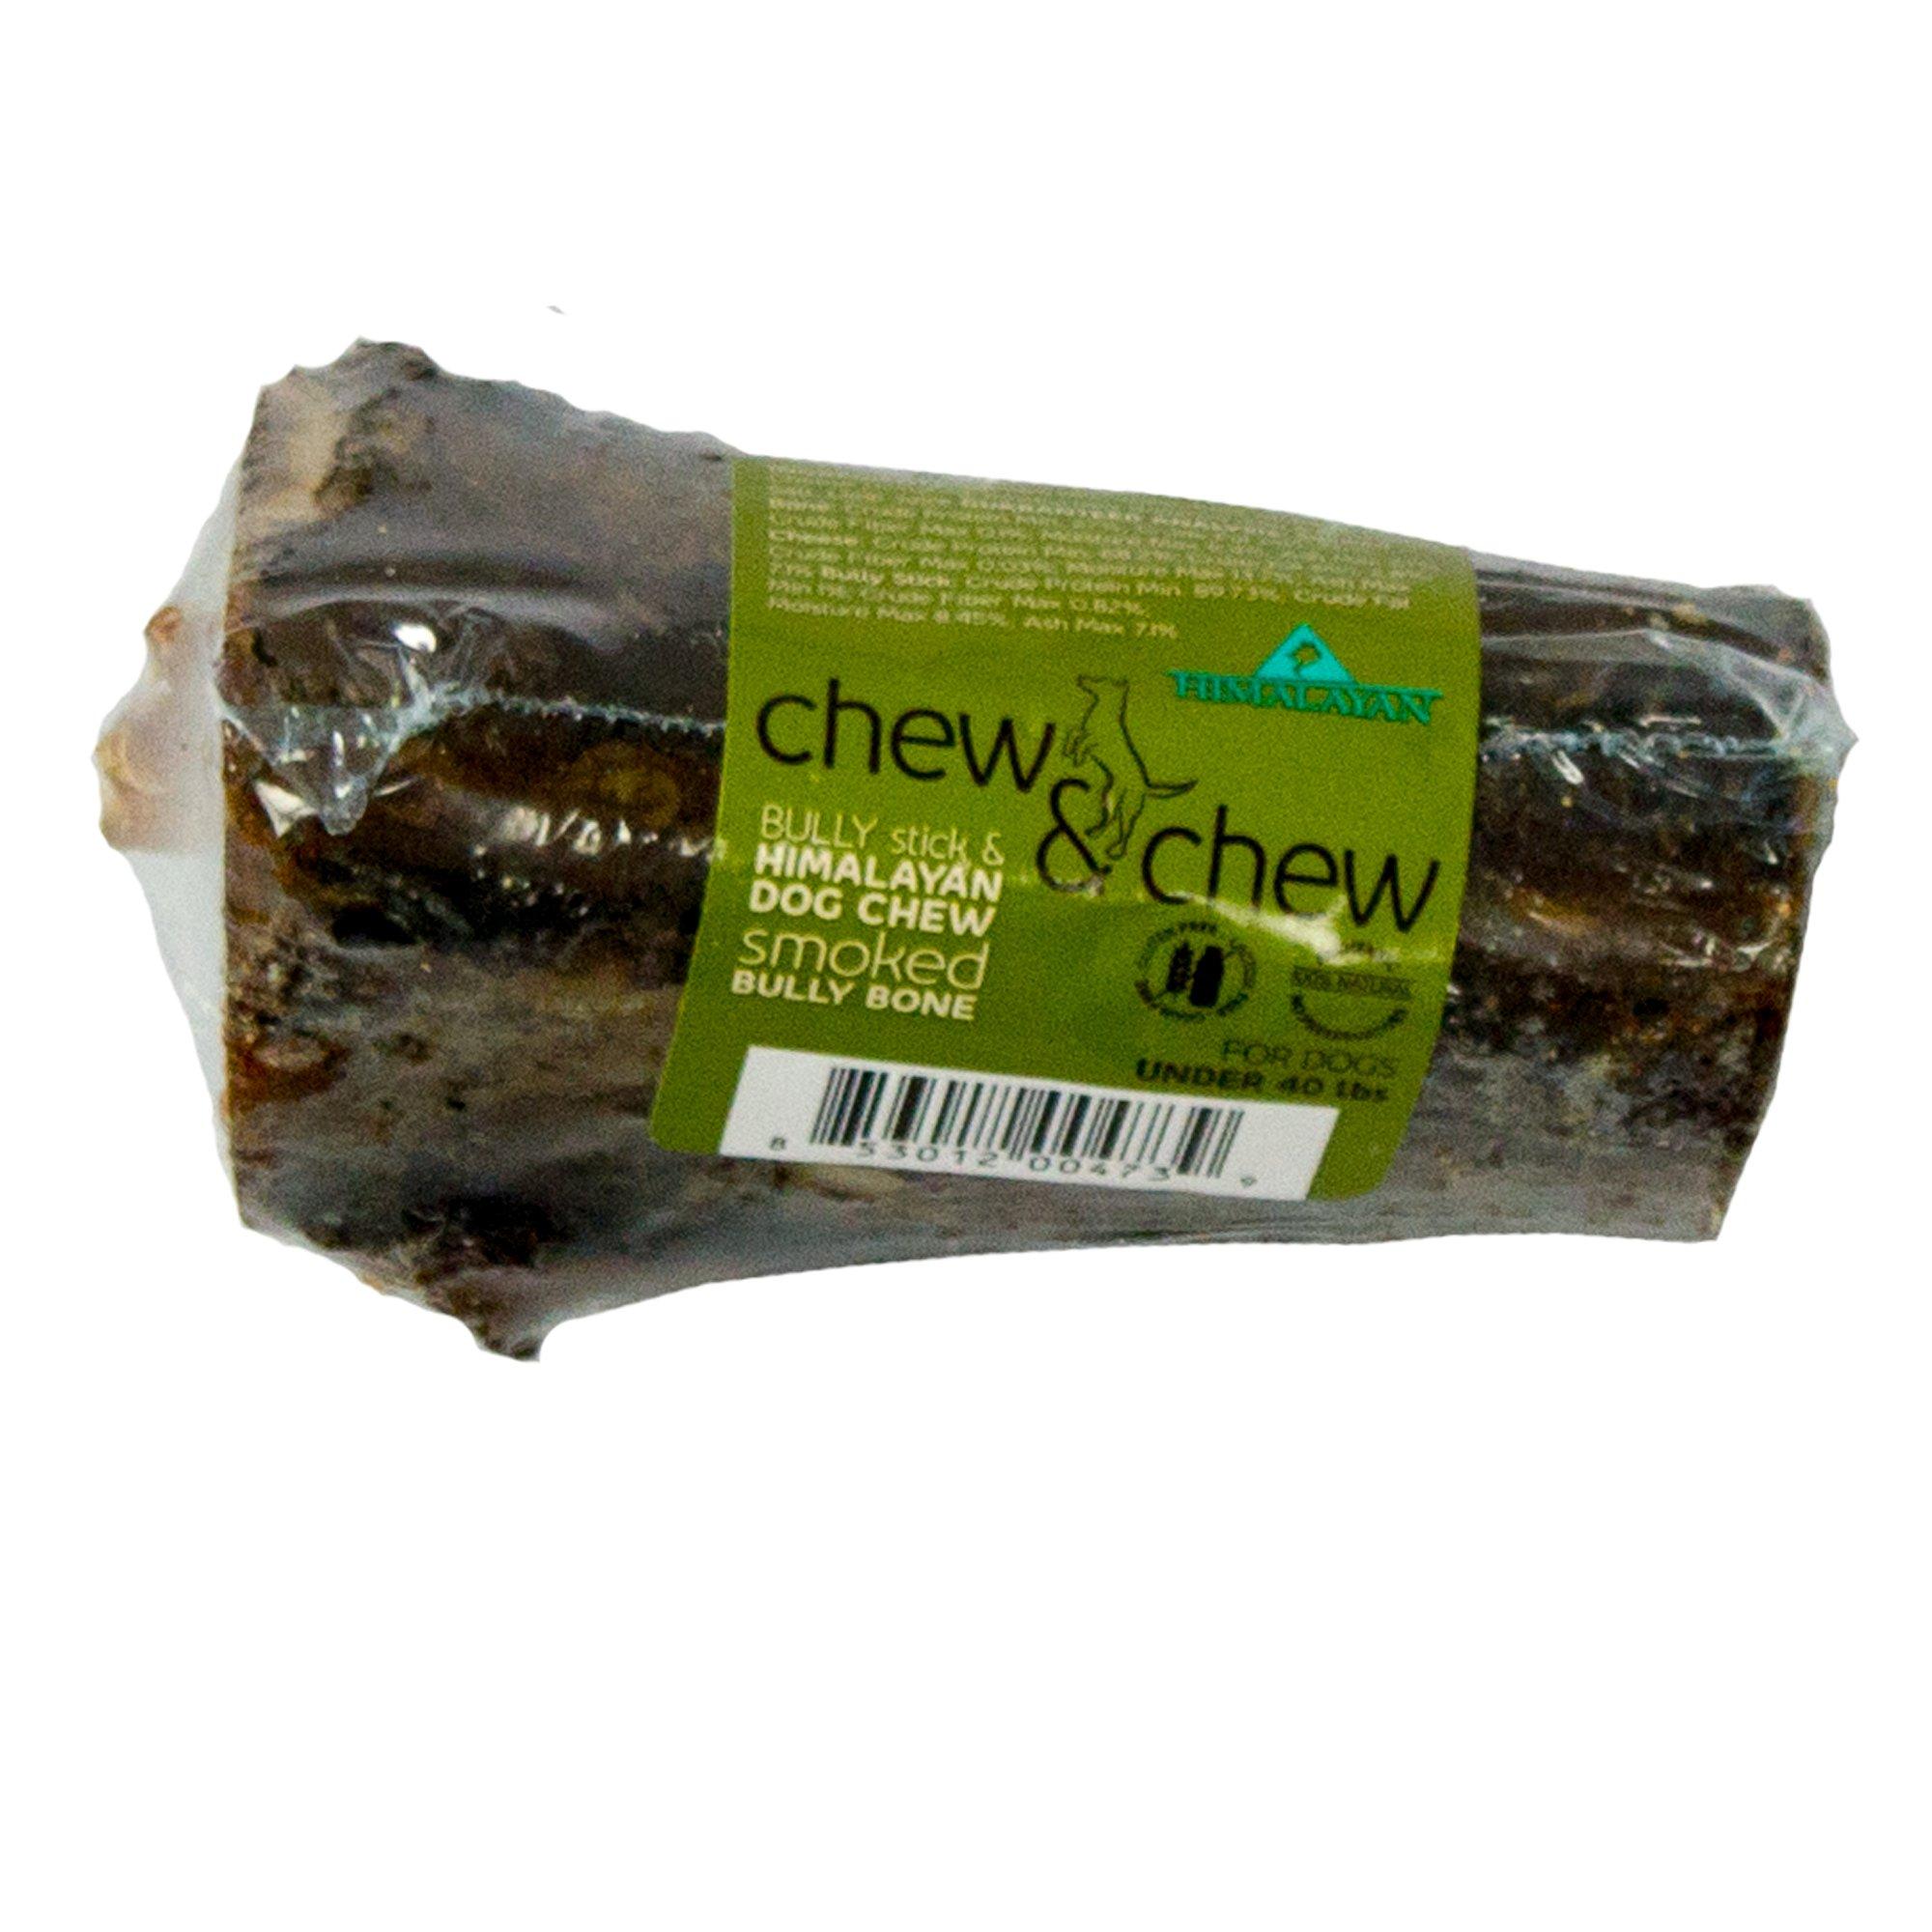 Himalayan Chew & Chew Medium Smoked Bully Bone